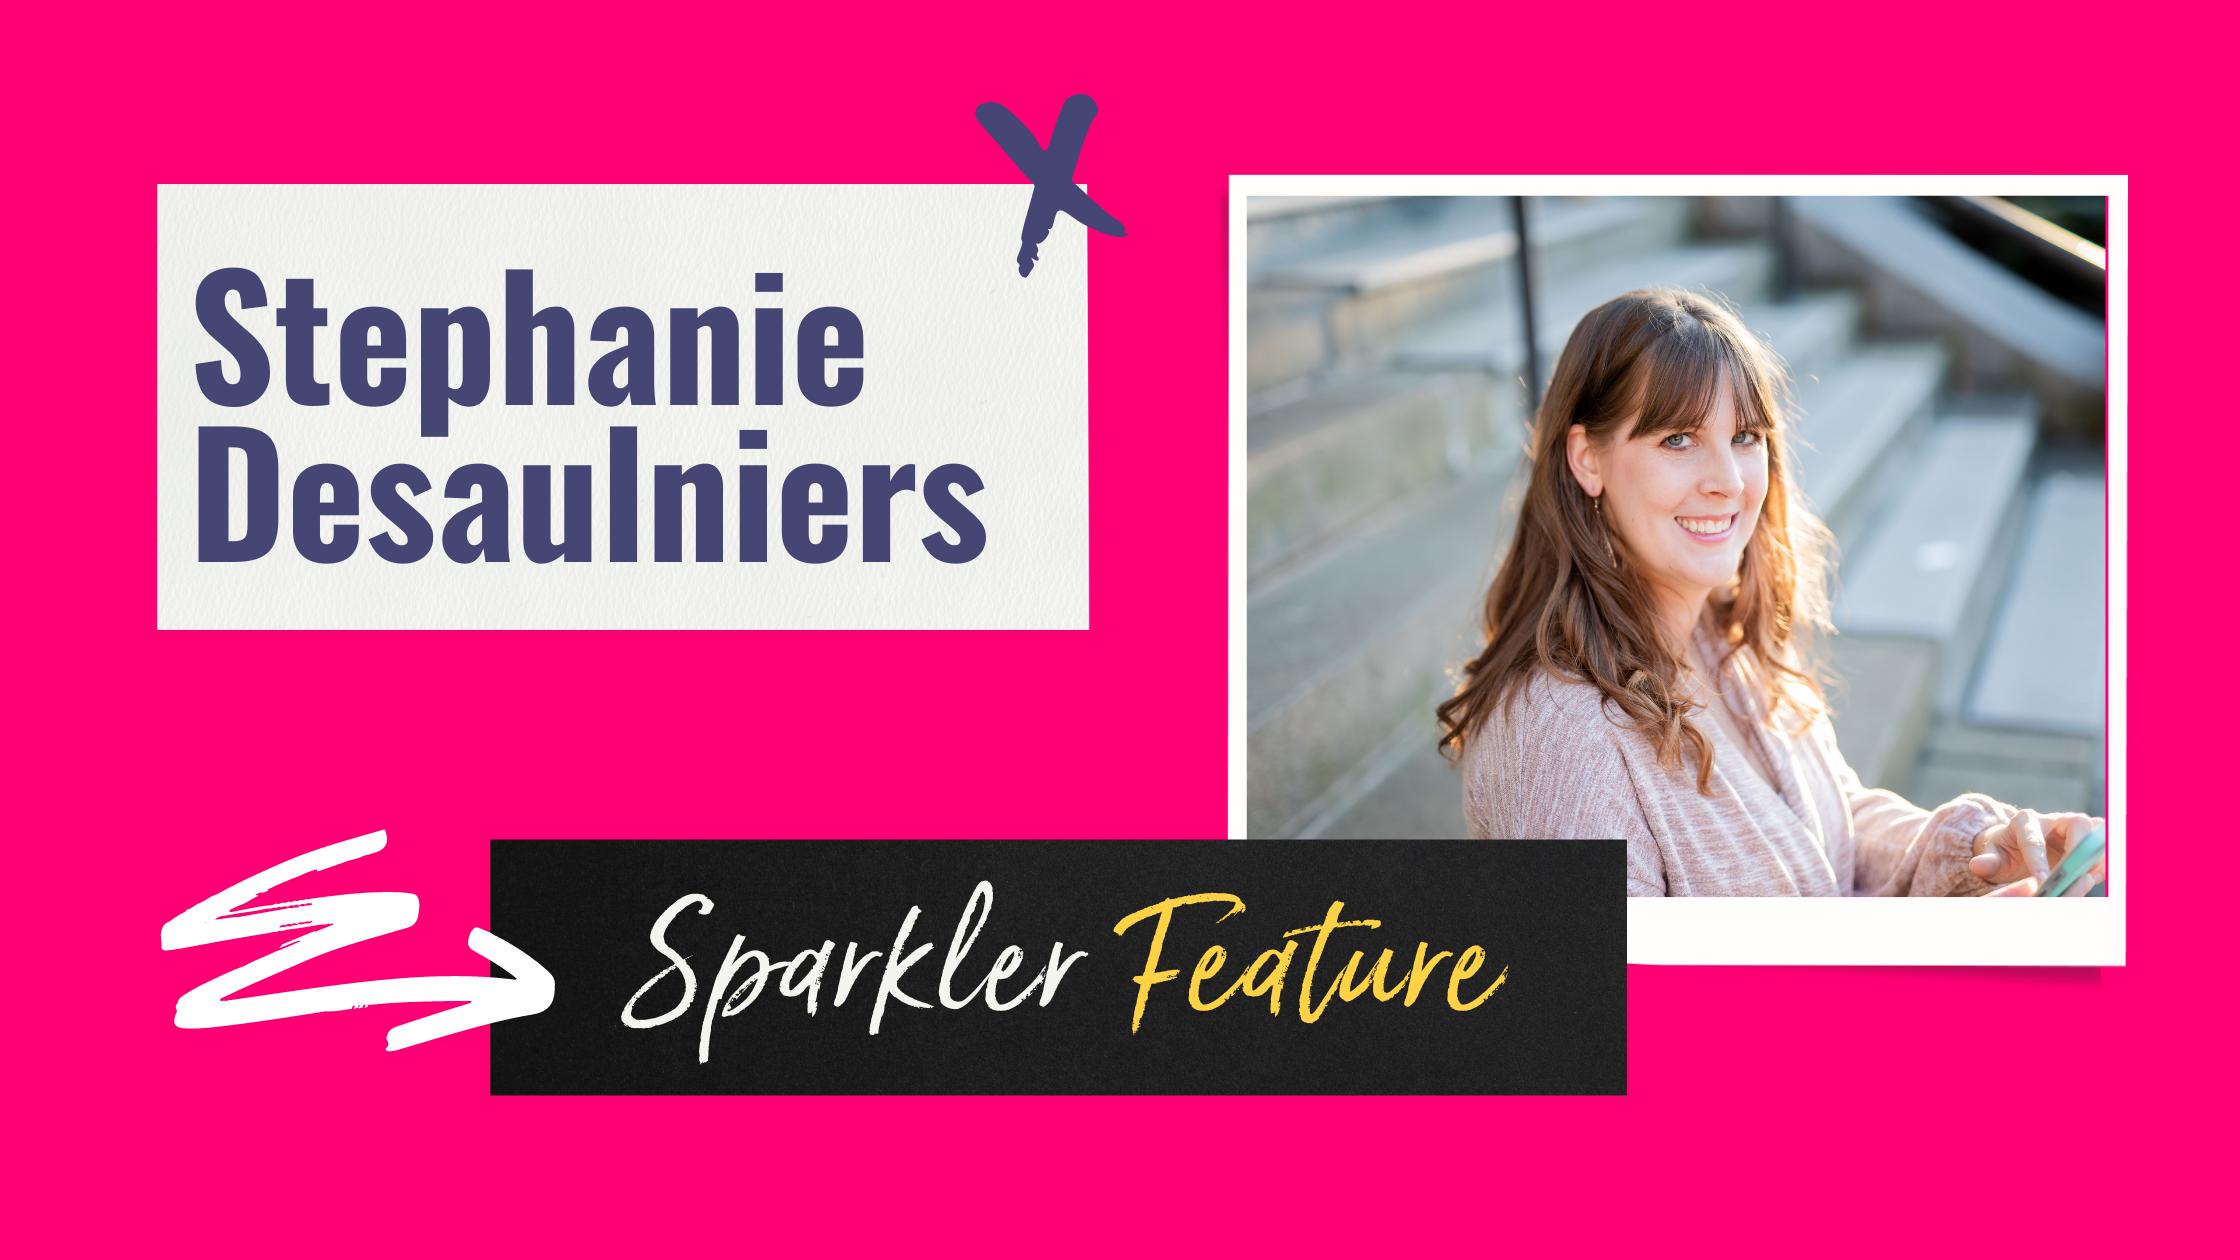 Stephanie Desaulniers Feature image